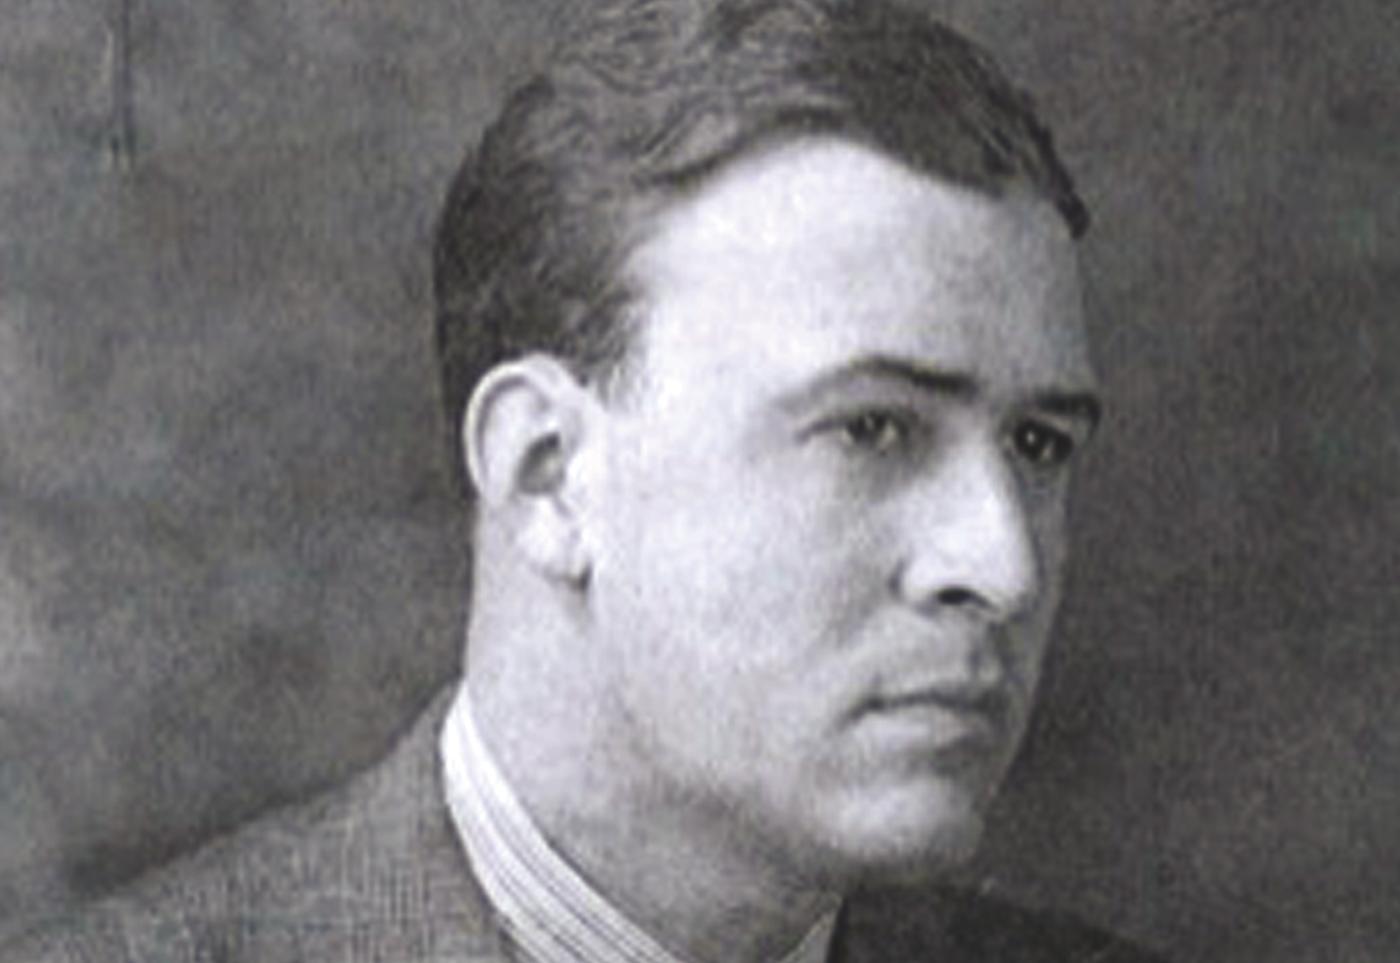 Special Agent Arthur Thurston